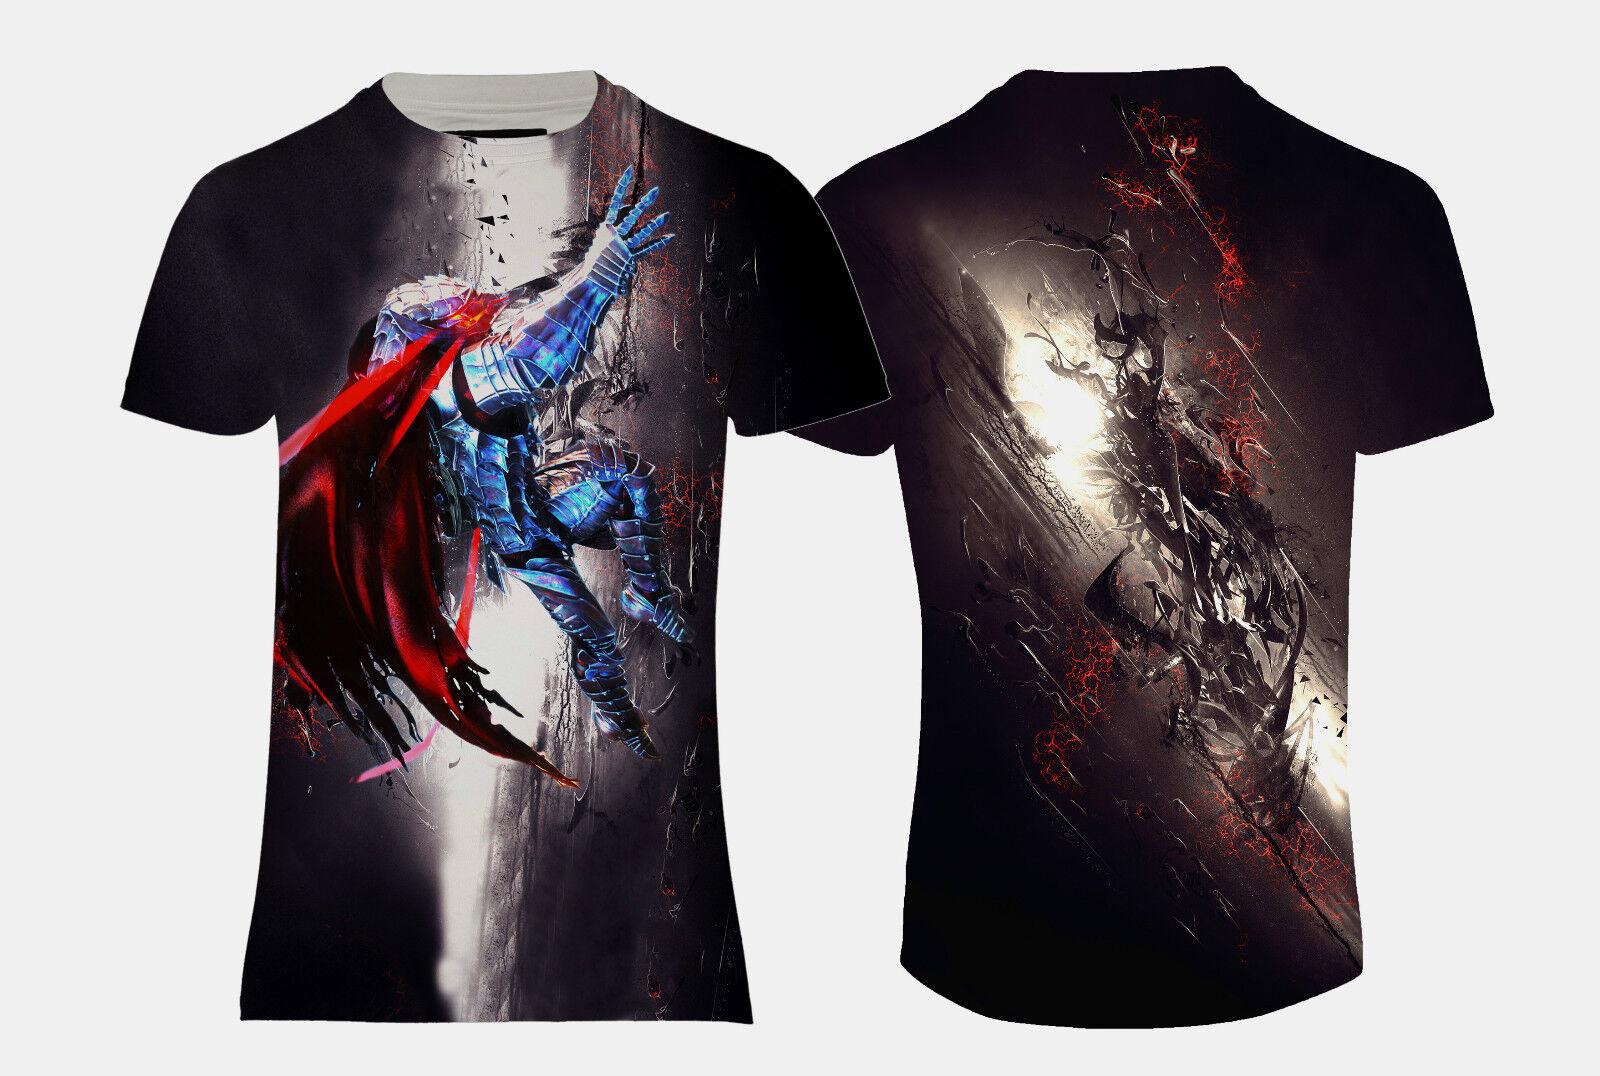 1cf3434a4a00 NEW BERSERK ANIME MANGA DESIGN ALL FULLY PRINTED TOP REGULAR SIZE T-SHIRT  OVER nwtgop10089-T-Shirts